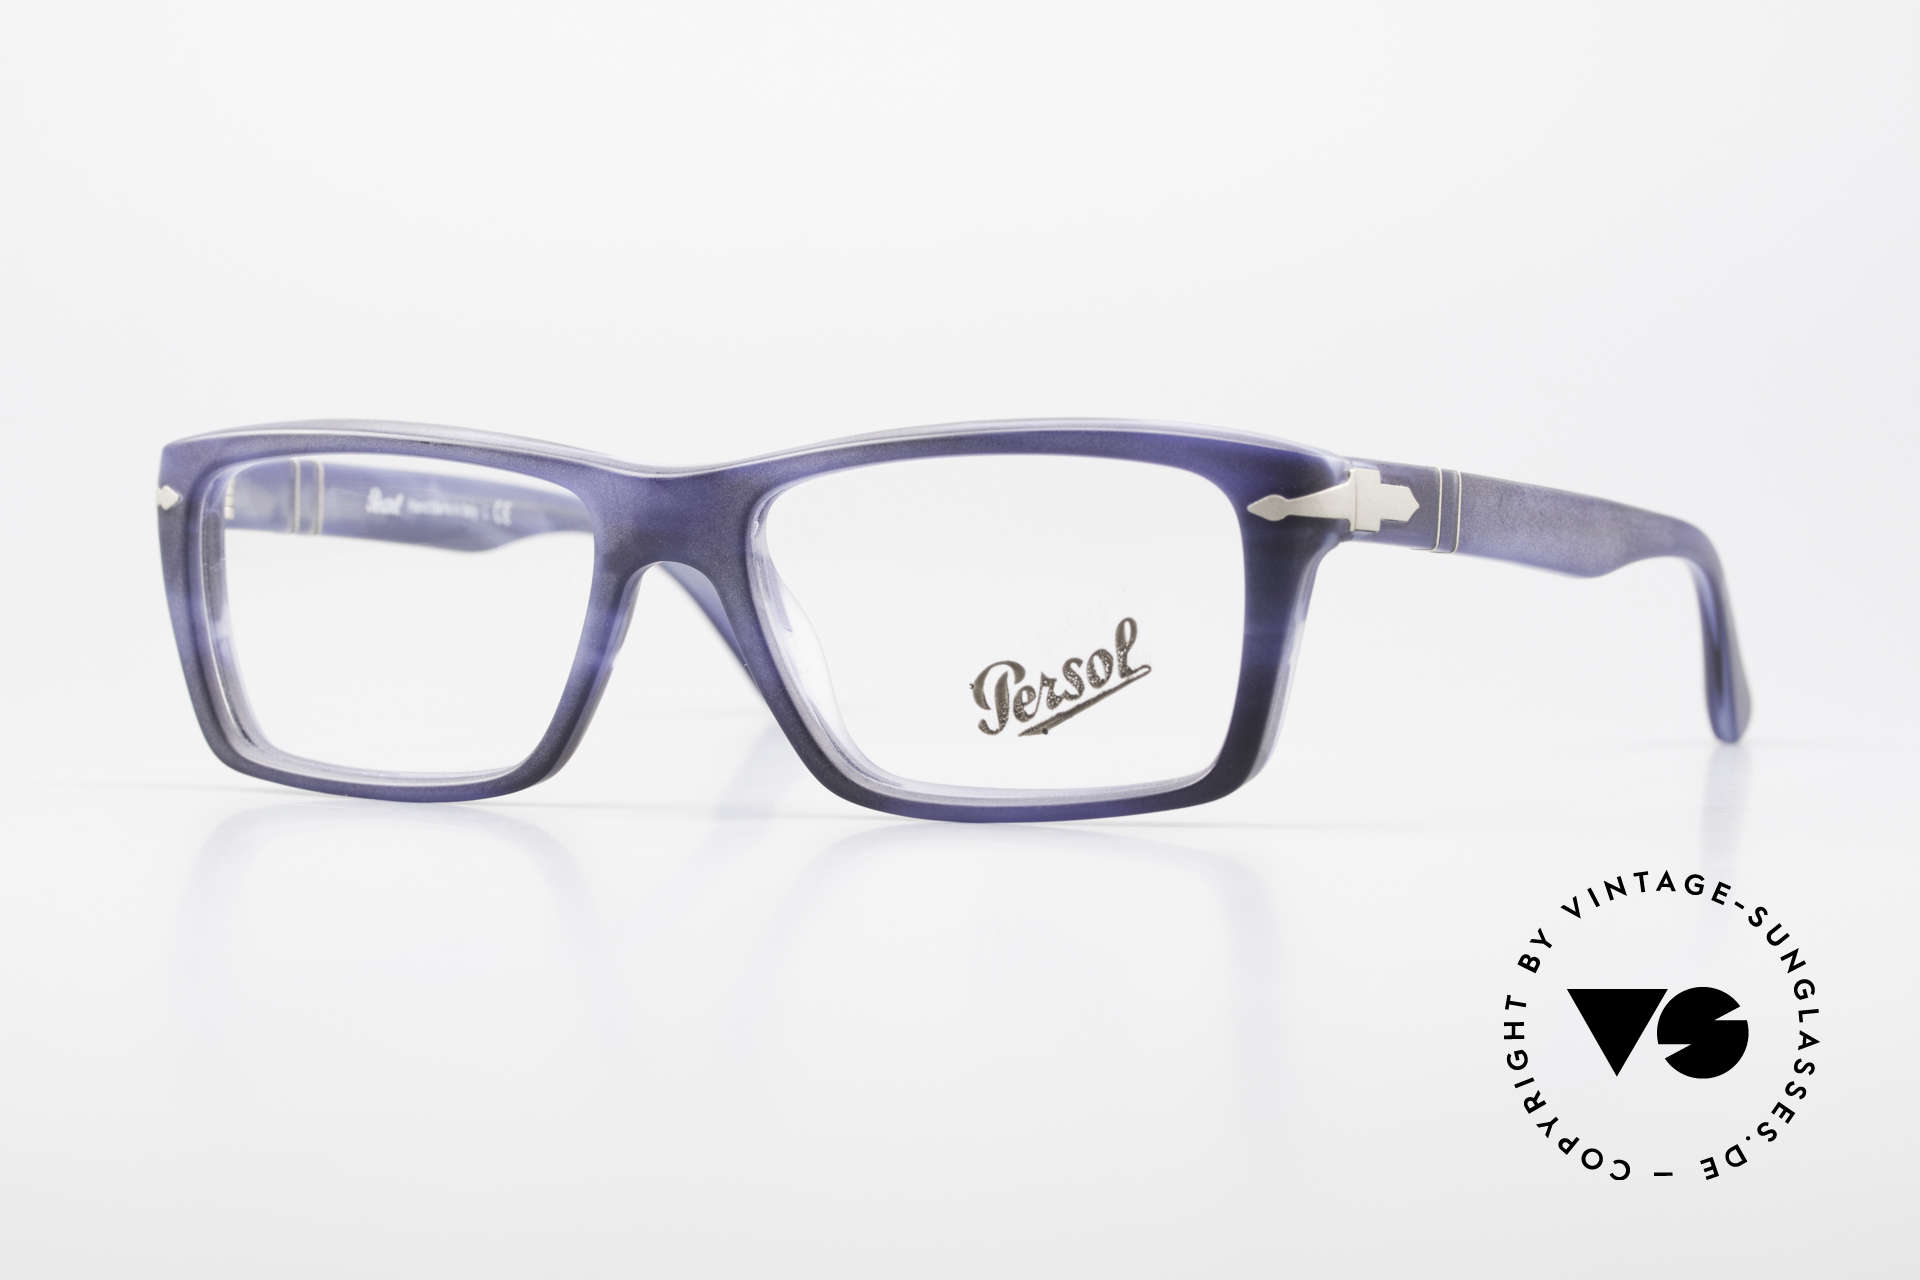 Persol 3060 Striking Eyeglasses For Men, PERSOL 3060: very striking eyeglasses for men, Made for Men